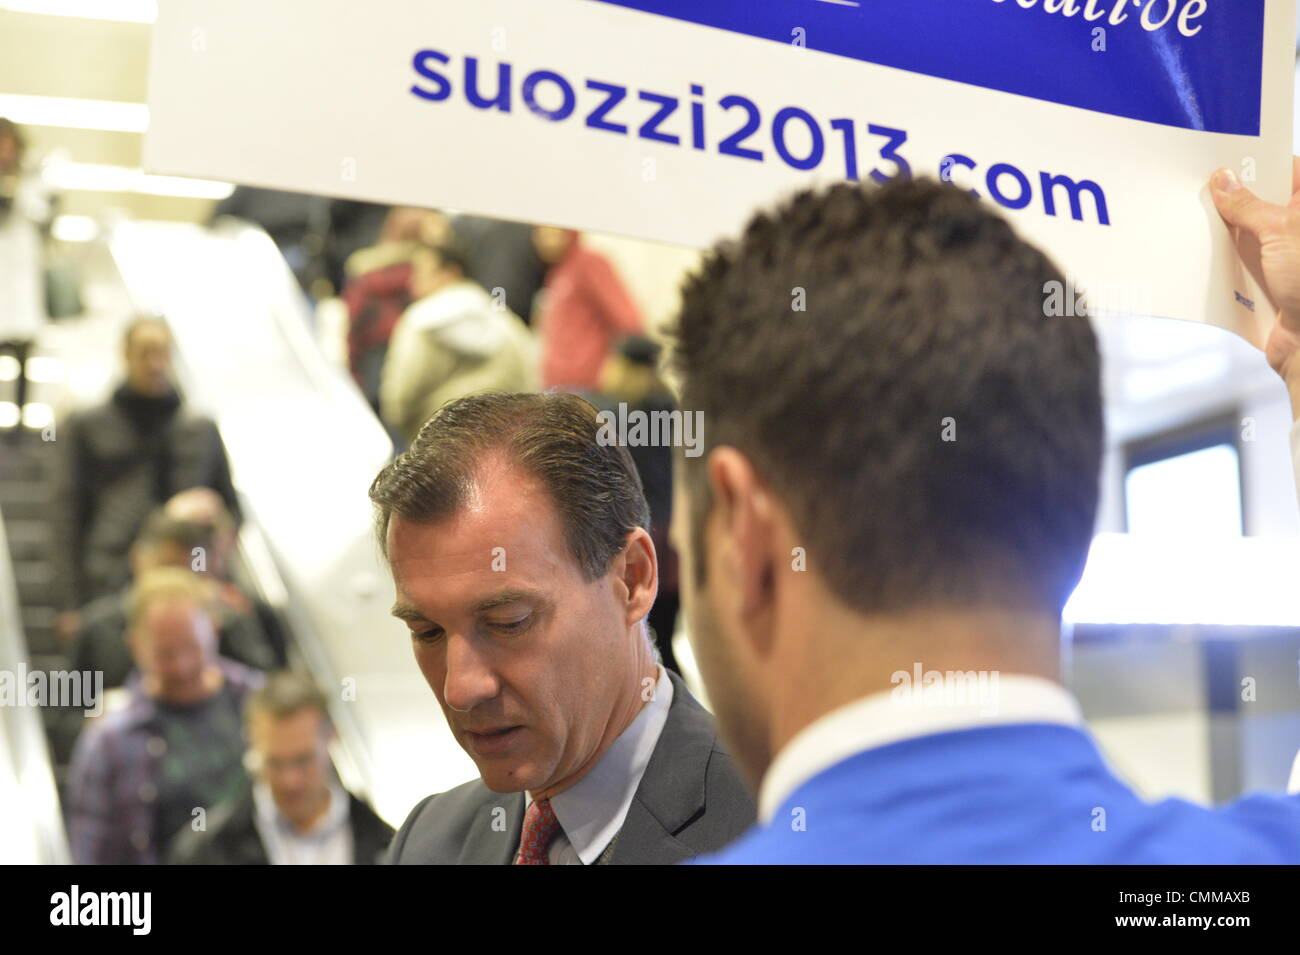 Manhattan, New York, U.S. 4th November 2013. TOM SUOZZI, Democratic candidate for Nassau County Executive, (center - Stock Image